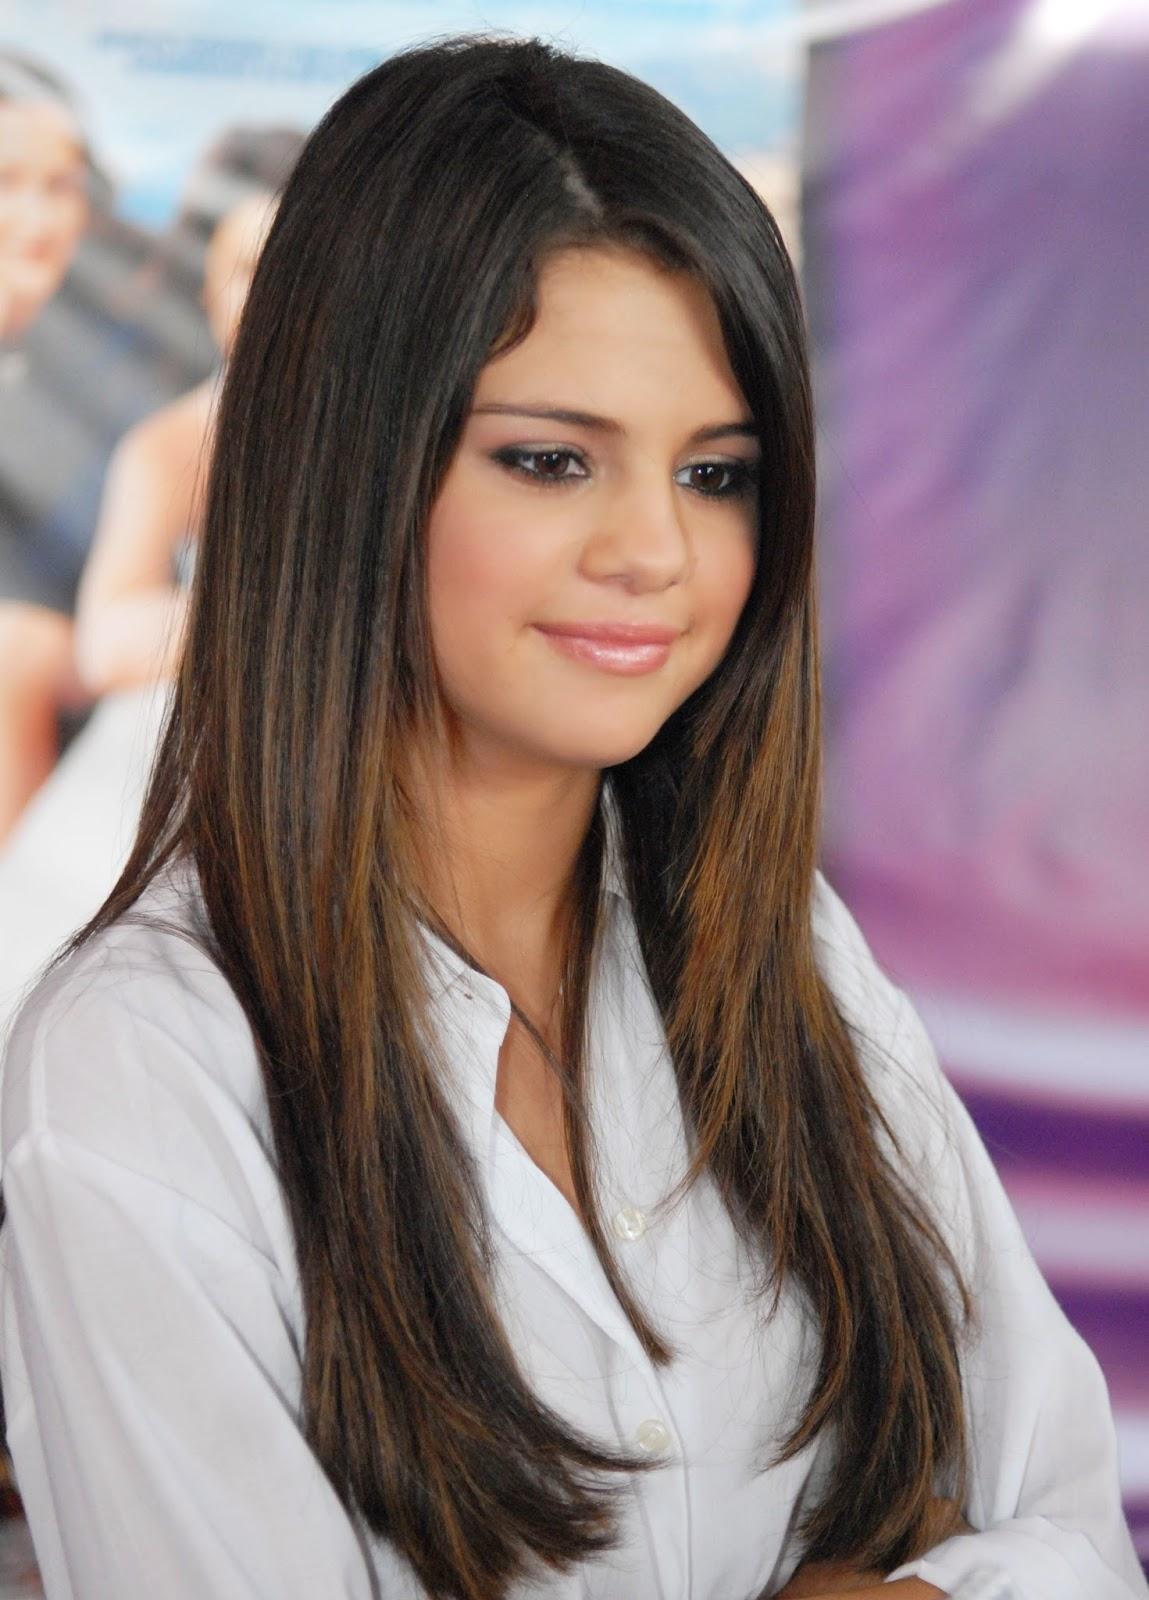 Awesome Celebrity Hairstyles Celebrity Selena Gomez Hairstyles Short Hairstyles Gunalazisus